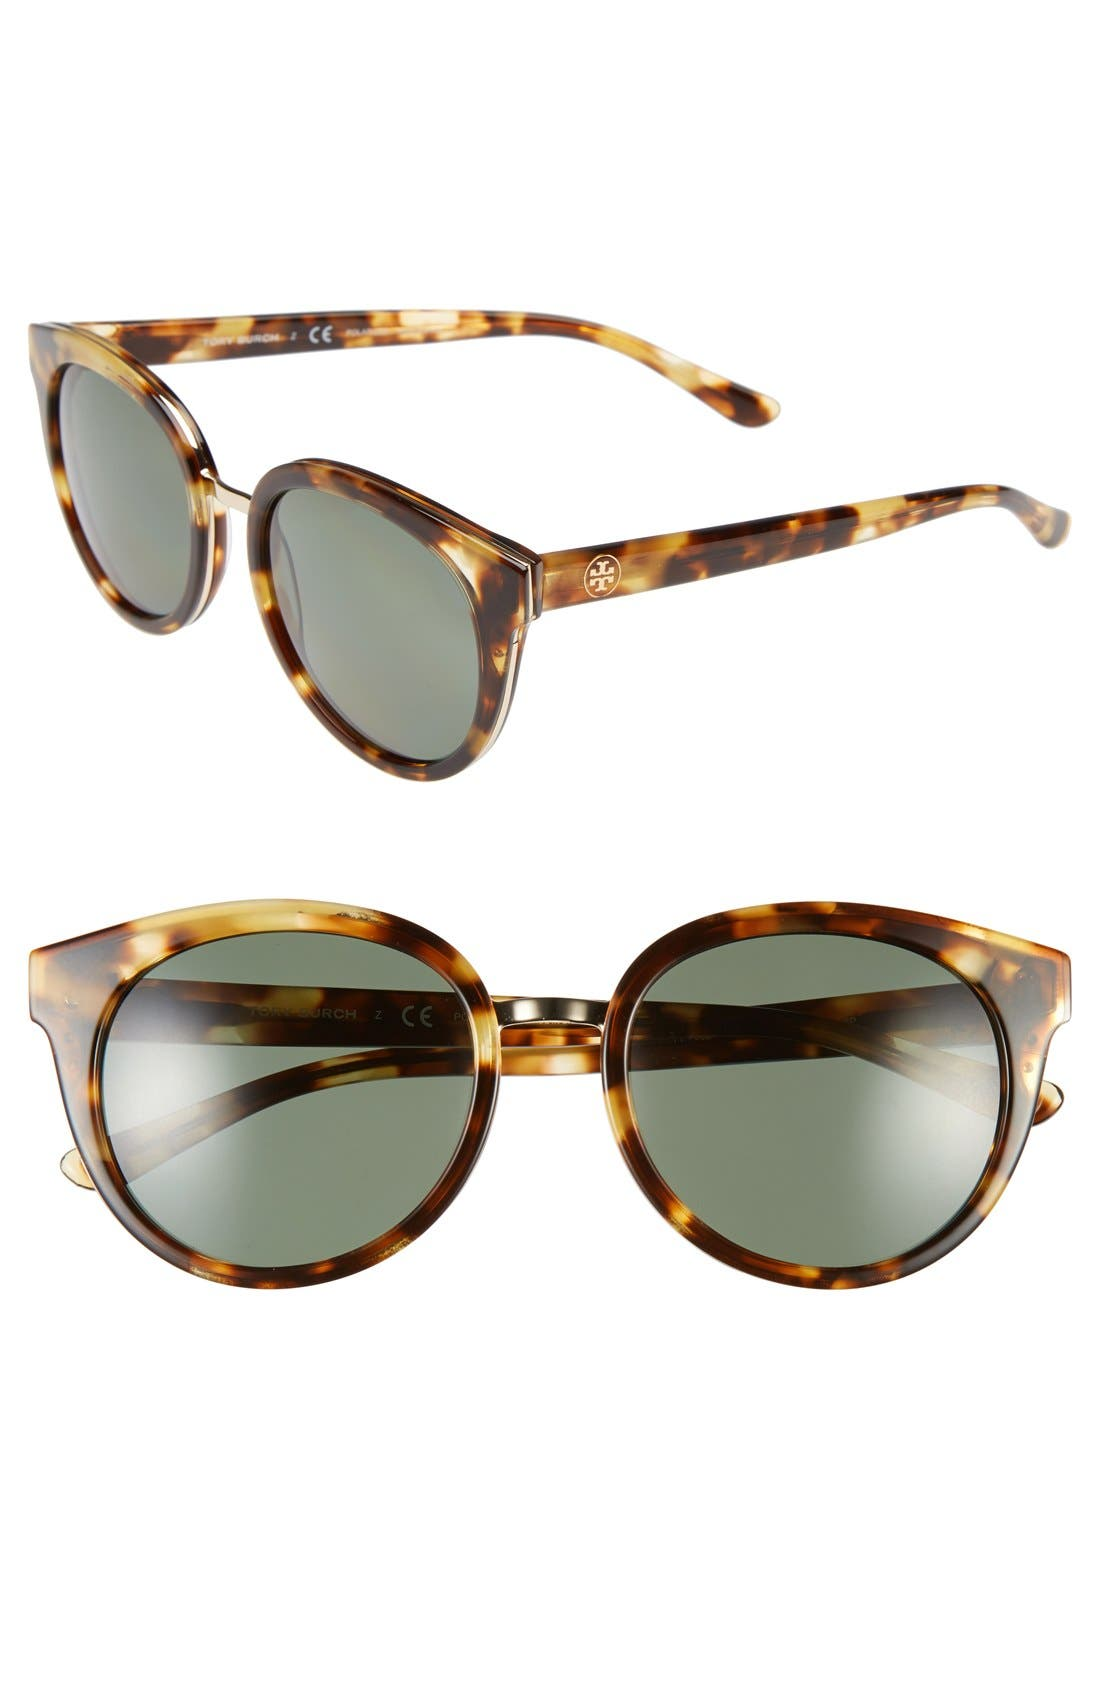 53mm Polarized Retro Sunglasses,                         Main,                         color, Light Tortoise/ Polar